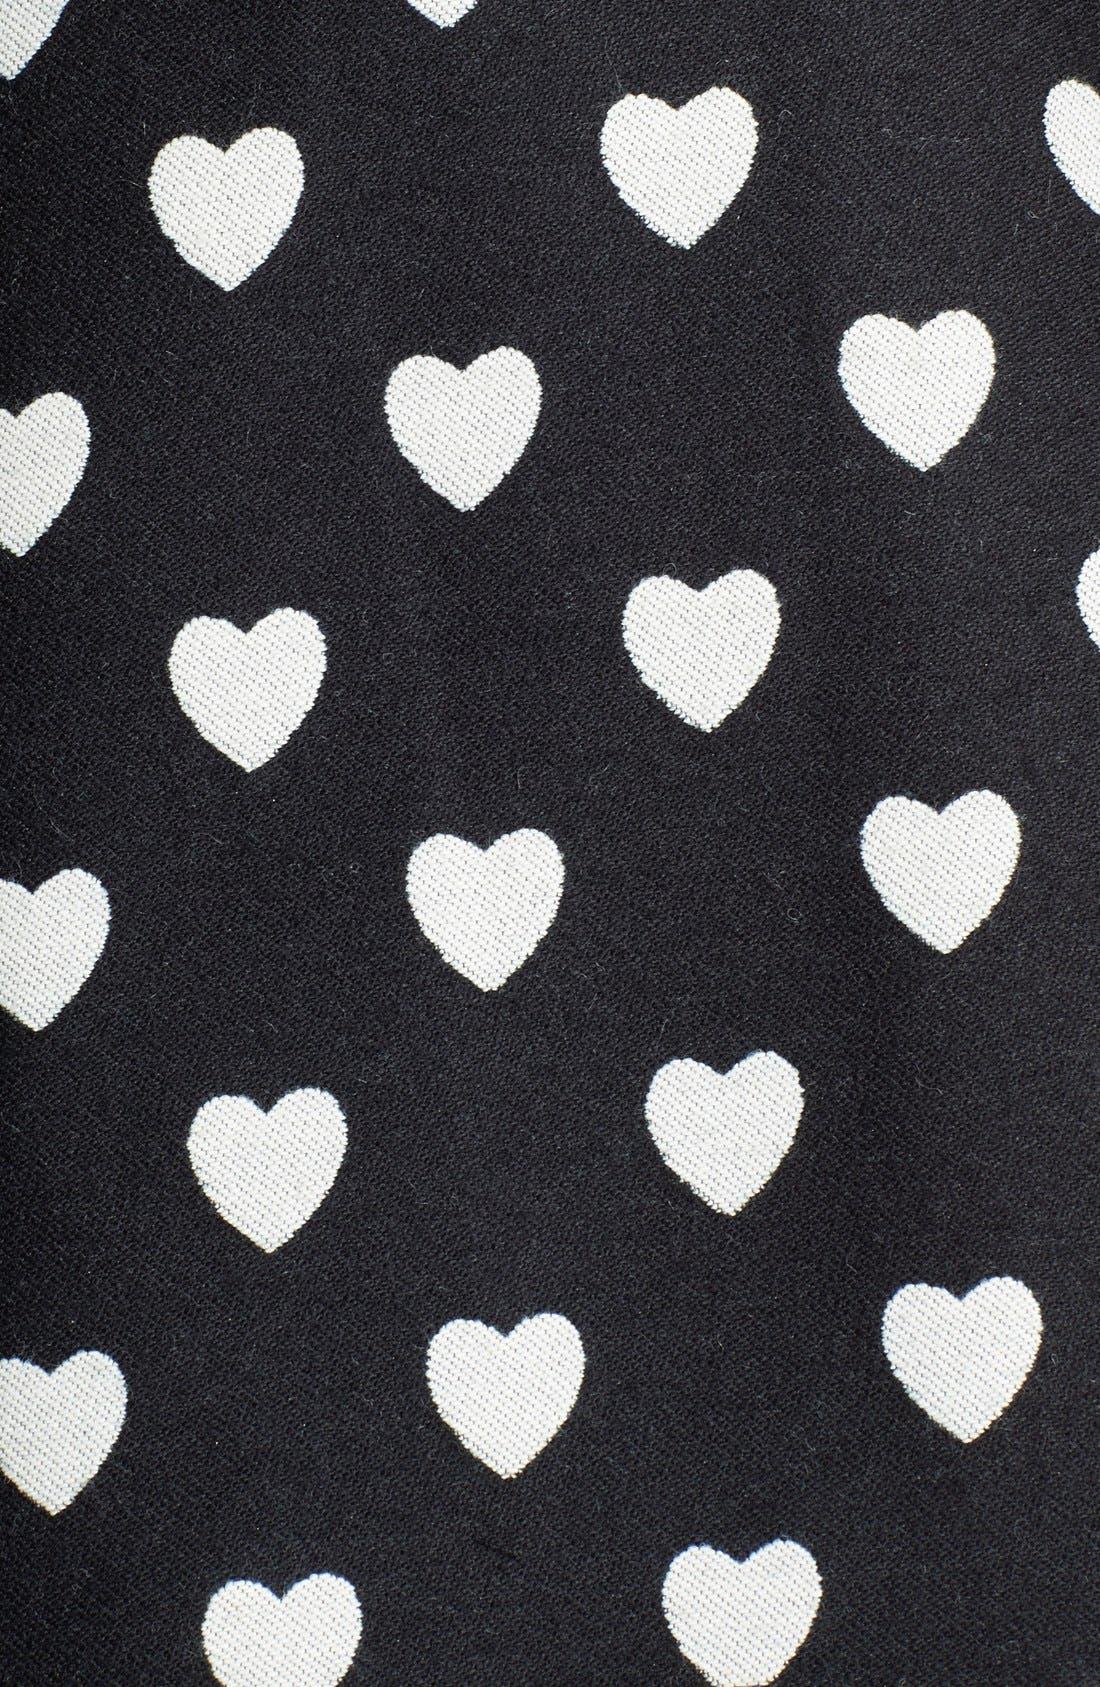 Alternate Image 3  - Alice + Olivia 'Amor' Fit & Flare Dress